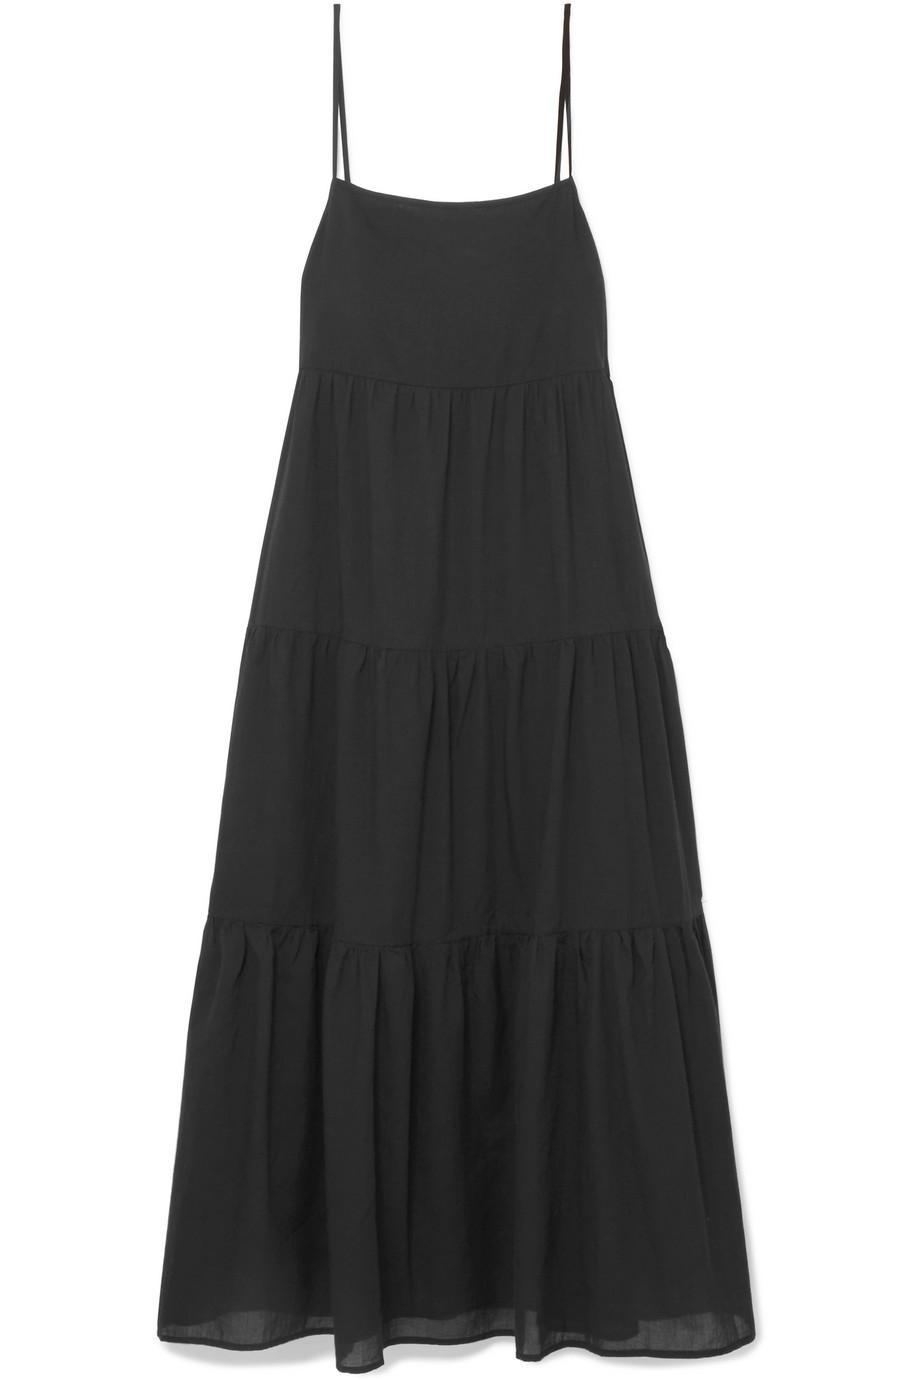 Tiered Cotton-voile Maxi Dress - Black Matteau 2018 Unisex Cheap Online Clearance Store Online Shopping Online RZRhYKo